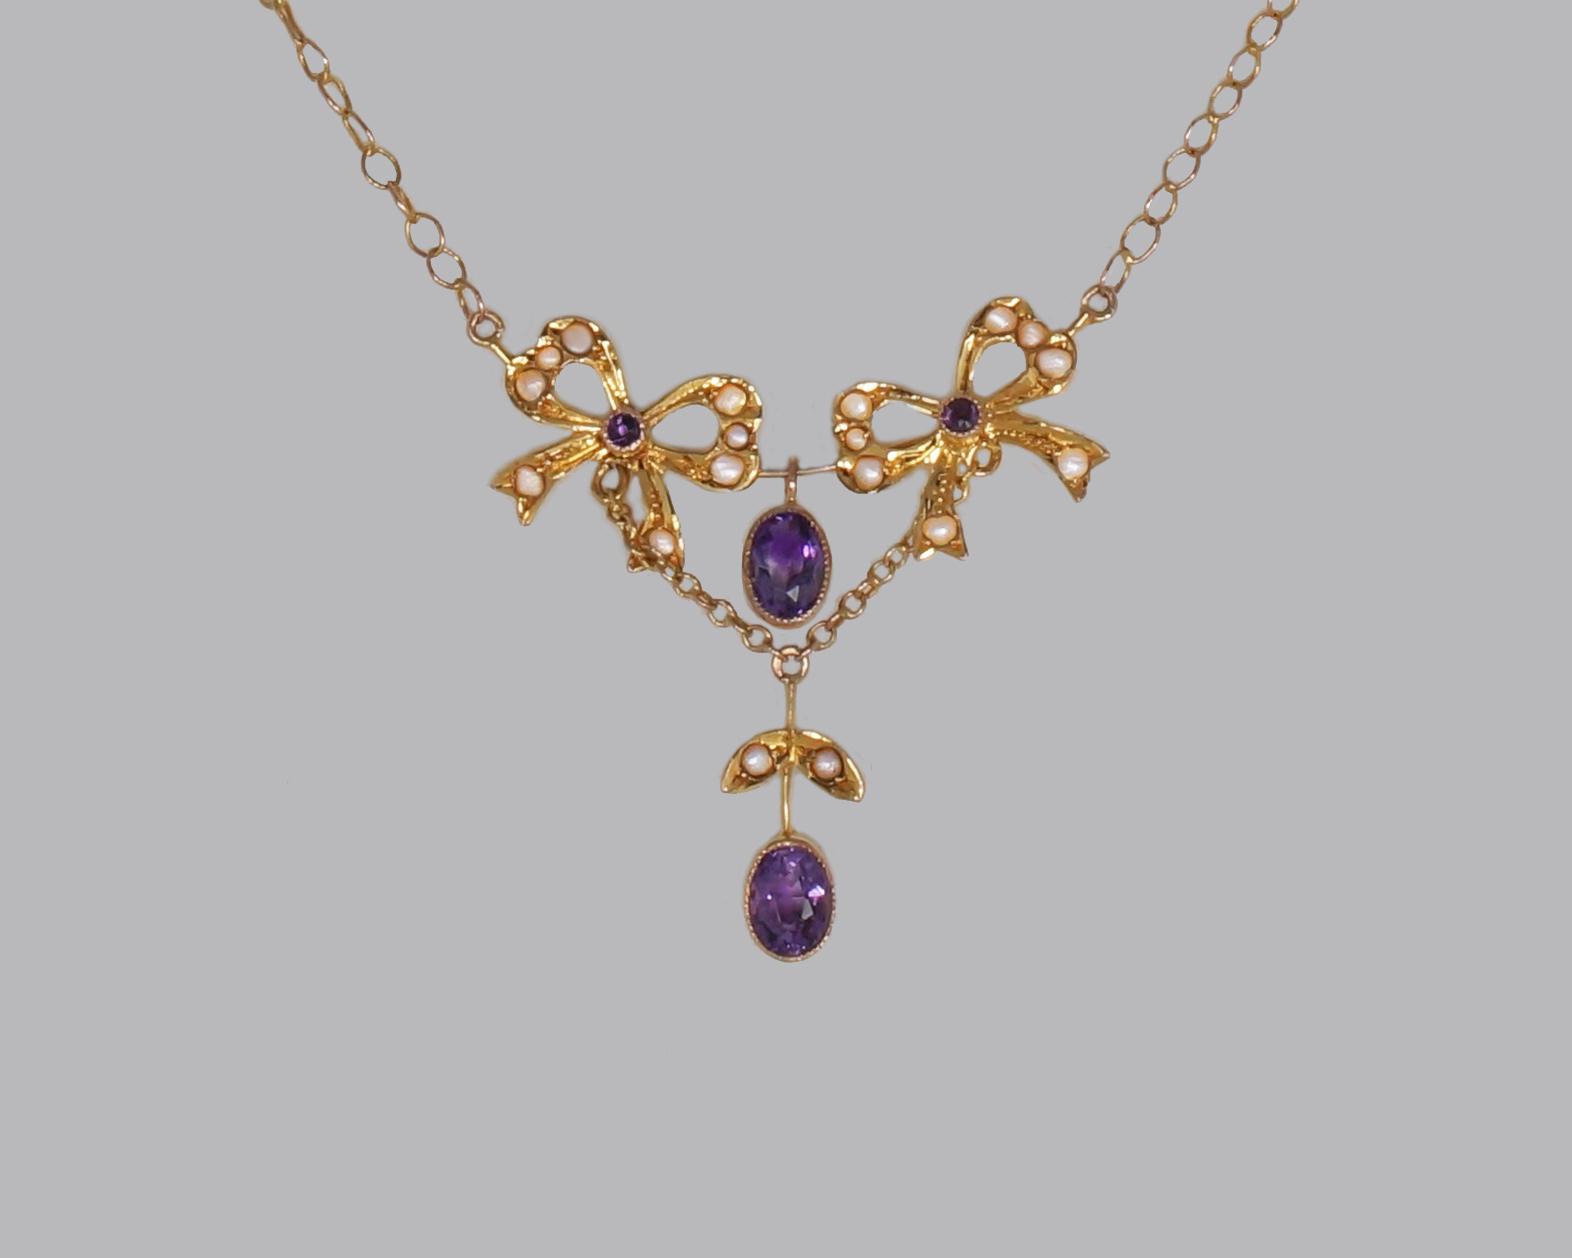 Belle Epoque Pearl Amethyst 15k Necklace